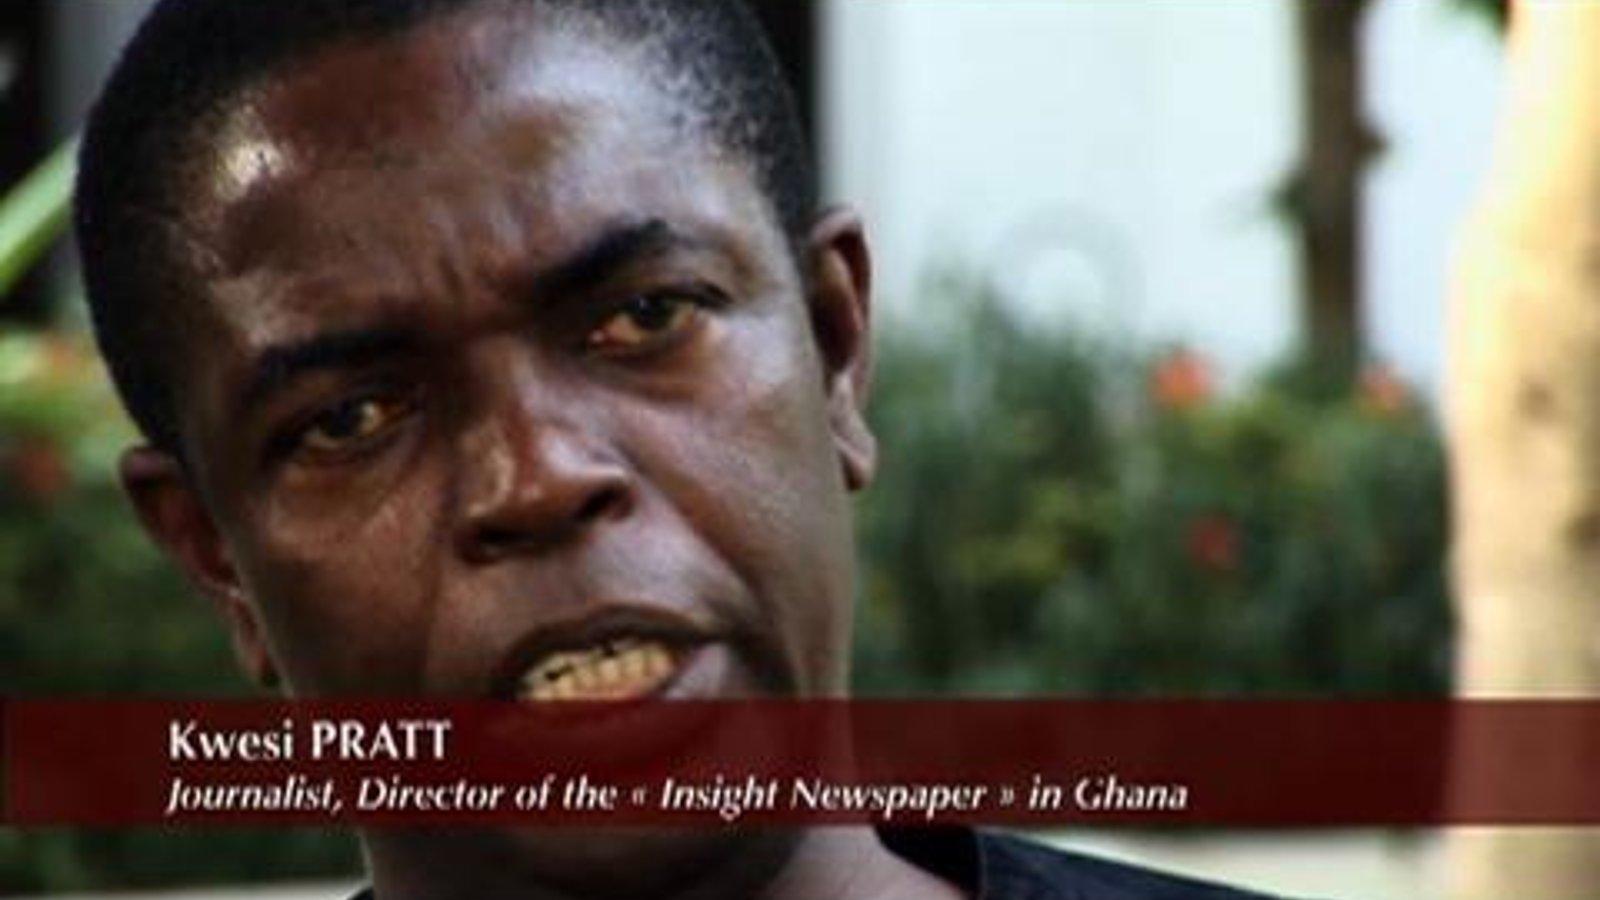 Burkina Faso, Africa: A Rectified Revolution